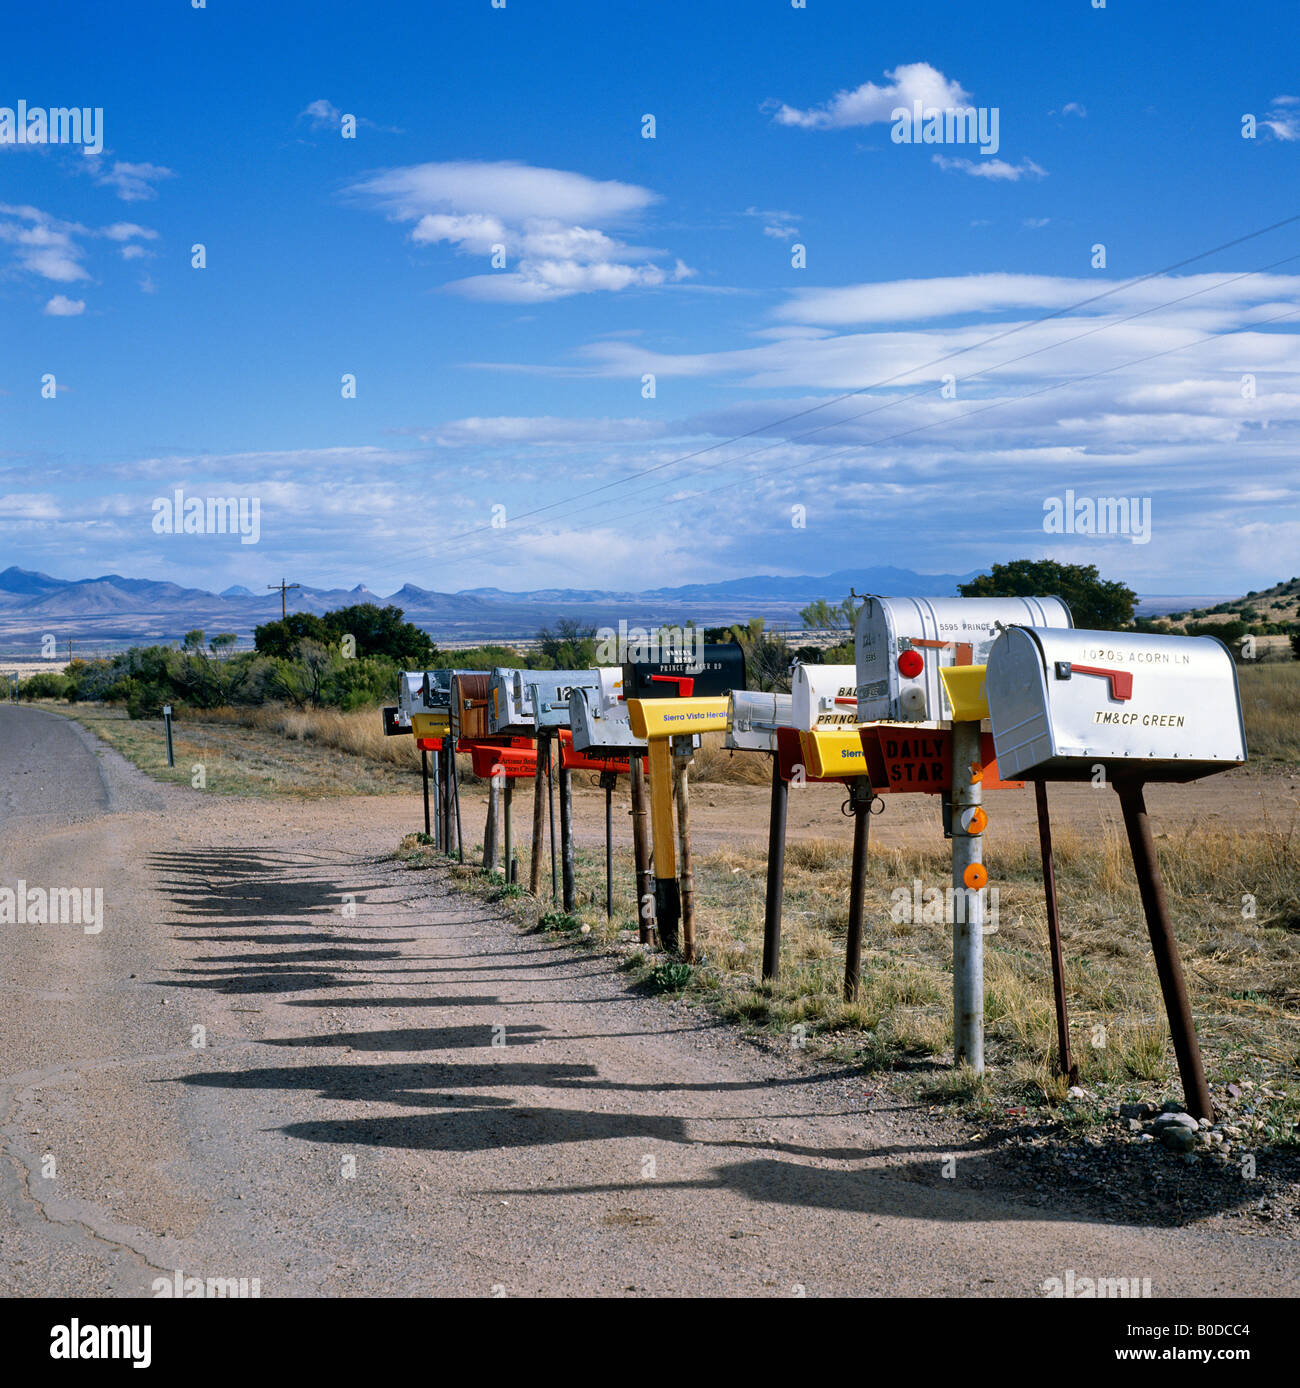 Row postal boxes, Arizona, USA - Stock Image